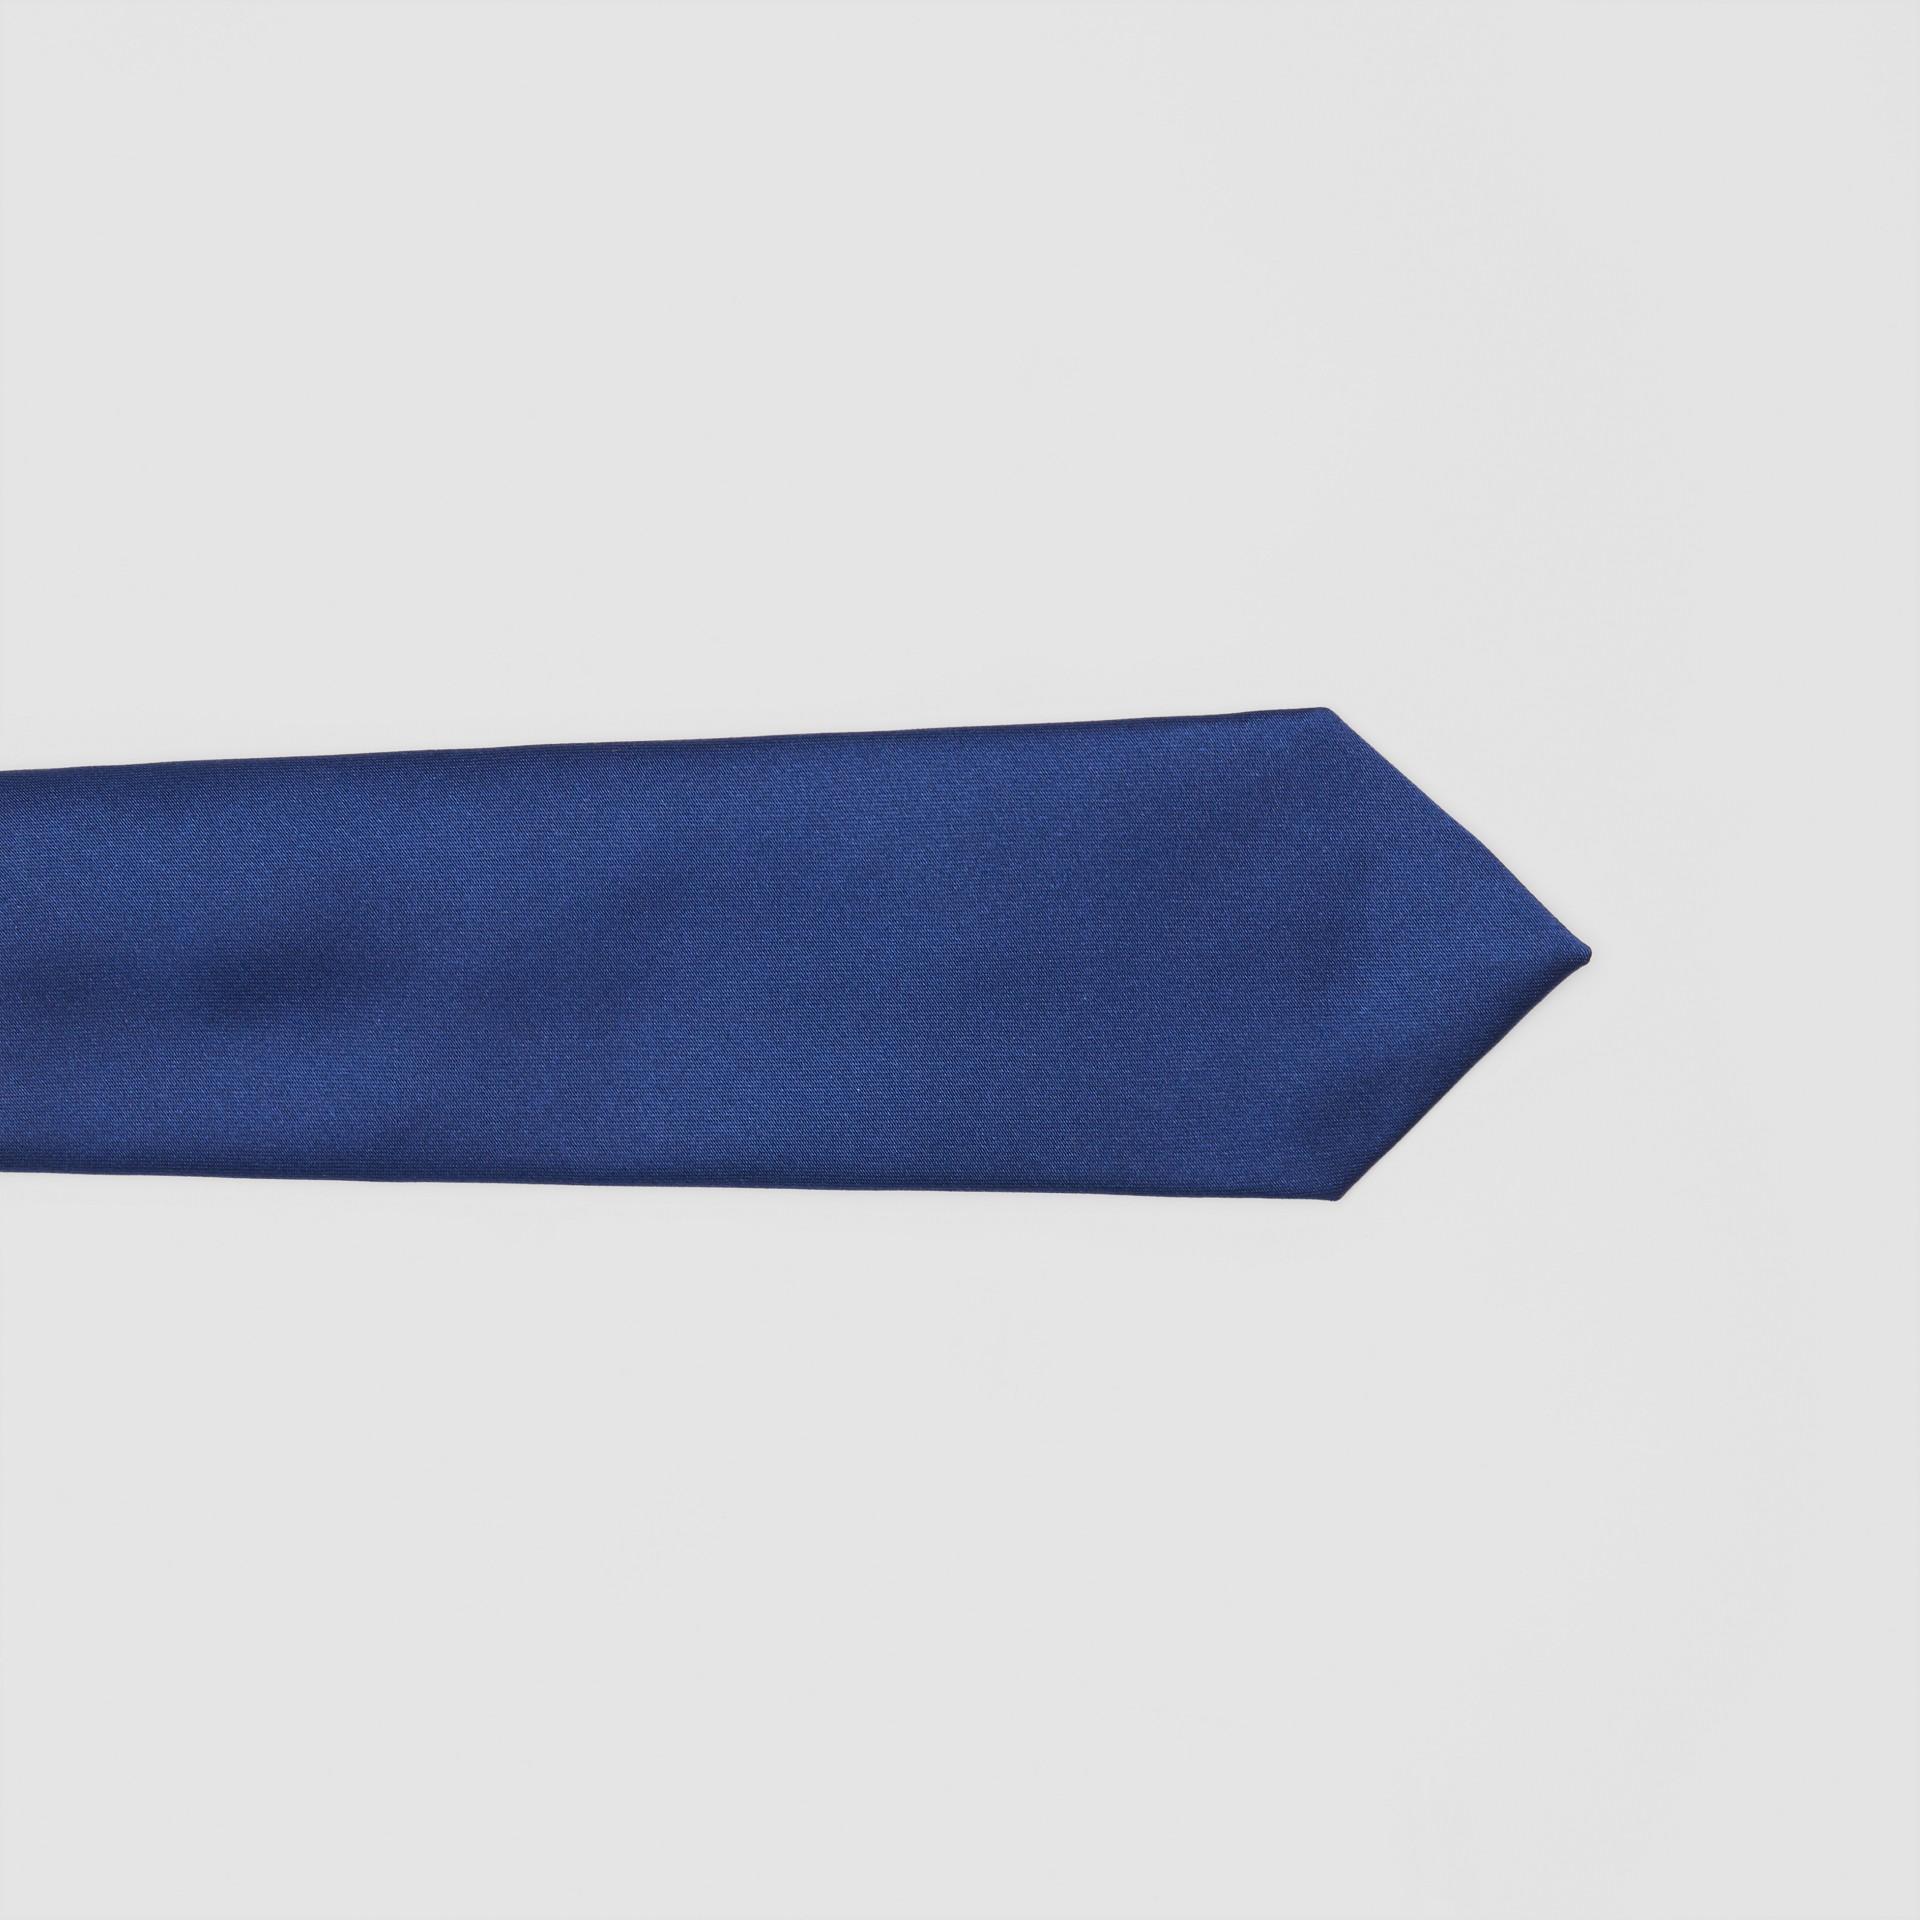 Classic Cut Logo Appliqué Silk Satin Tie in Sapphire Blue - Men | Burberry - gallery image 1